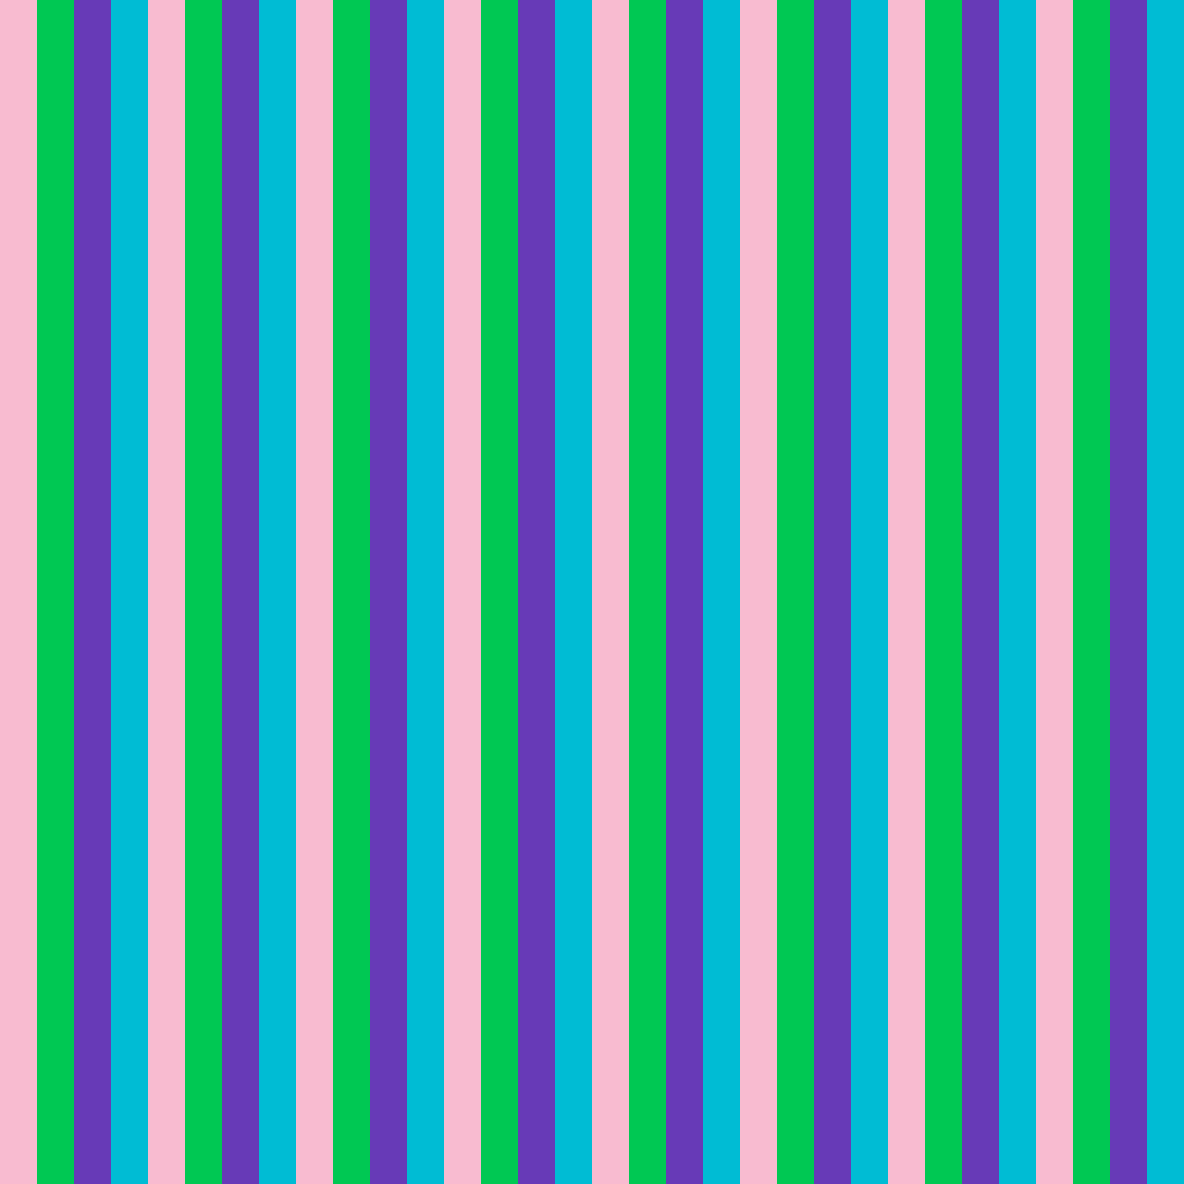 main-image-Easter stripes  by pixilgirl101